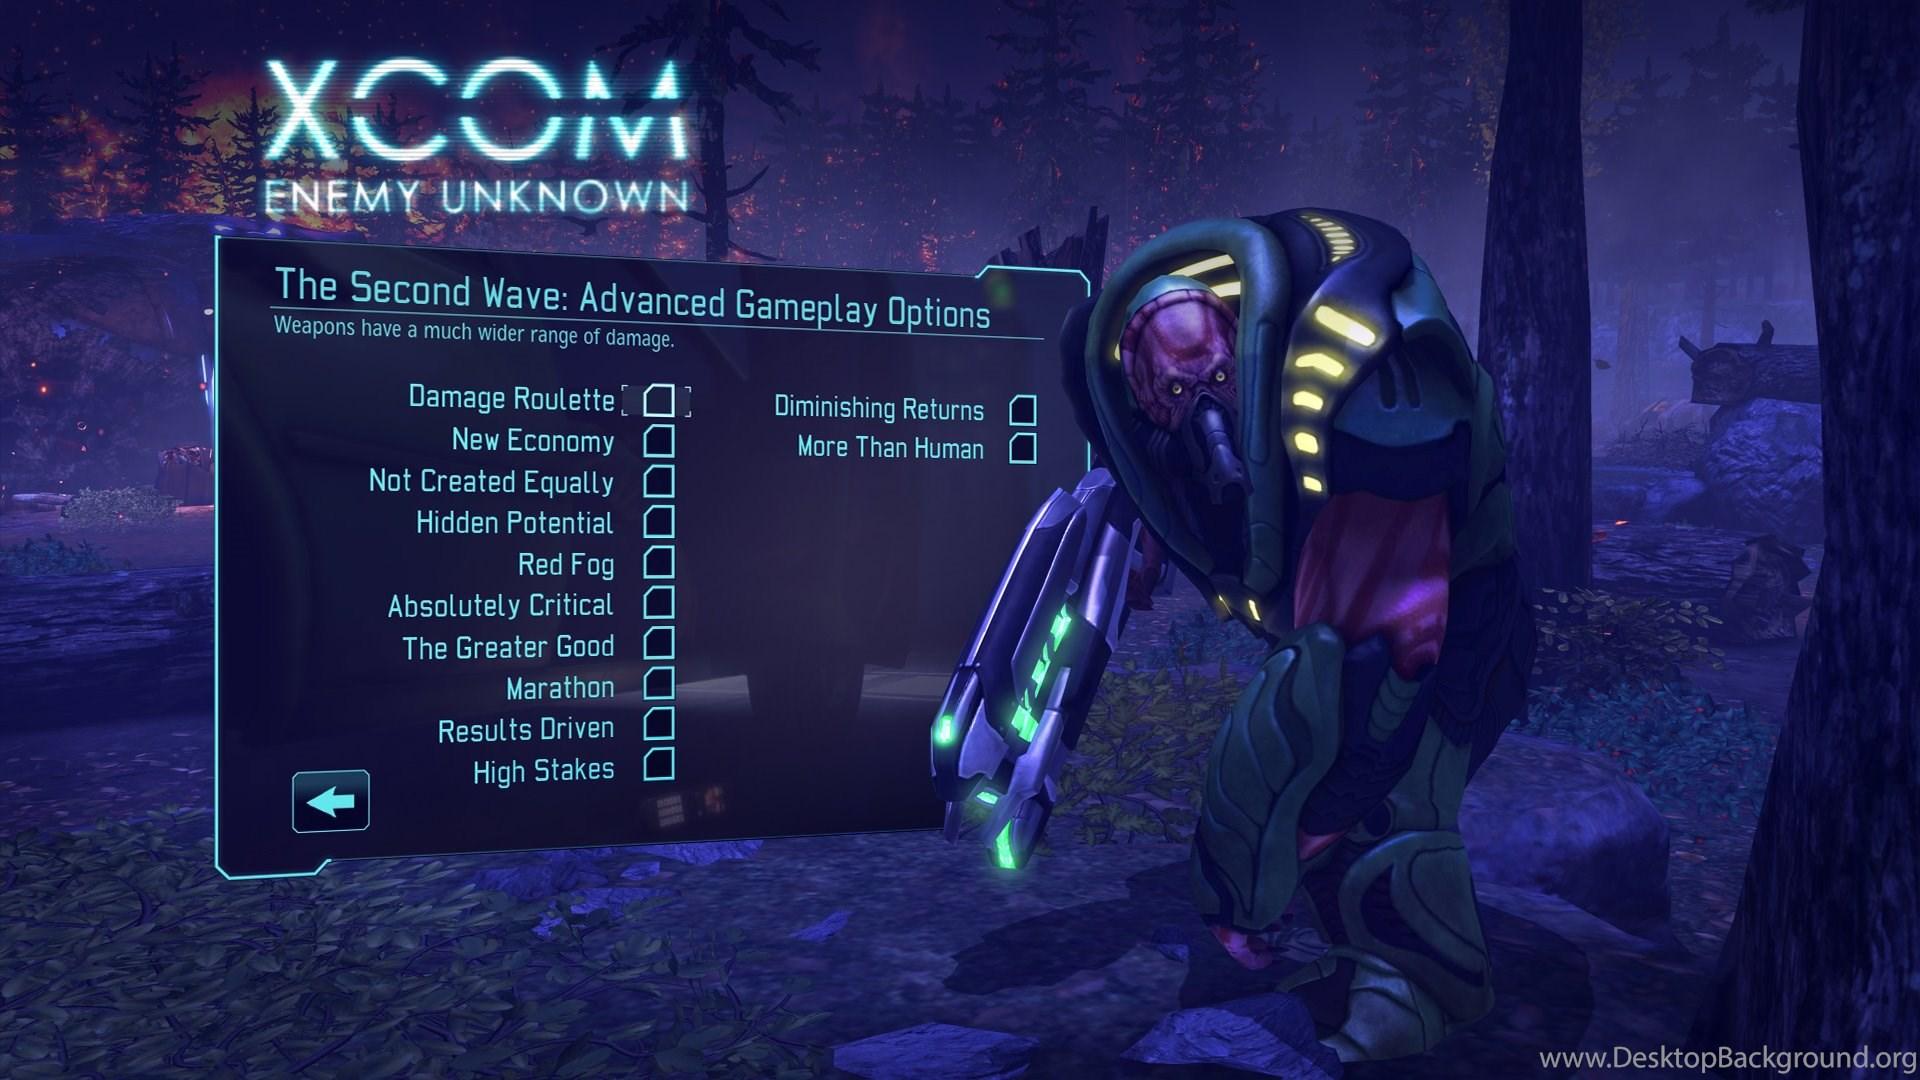 xcom enemy unknown sci fi 8 wallpapers desktop background